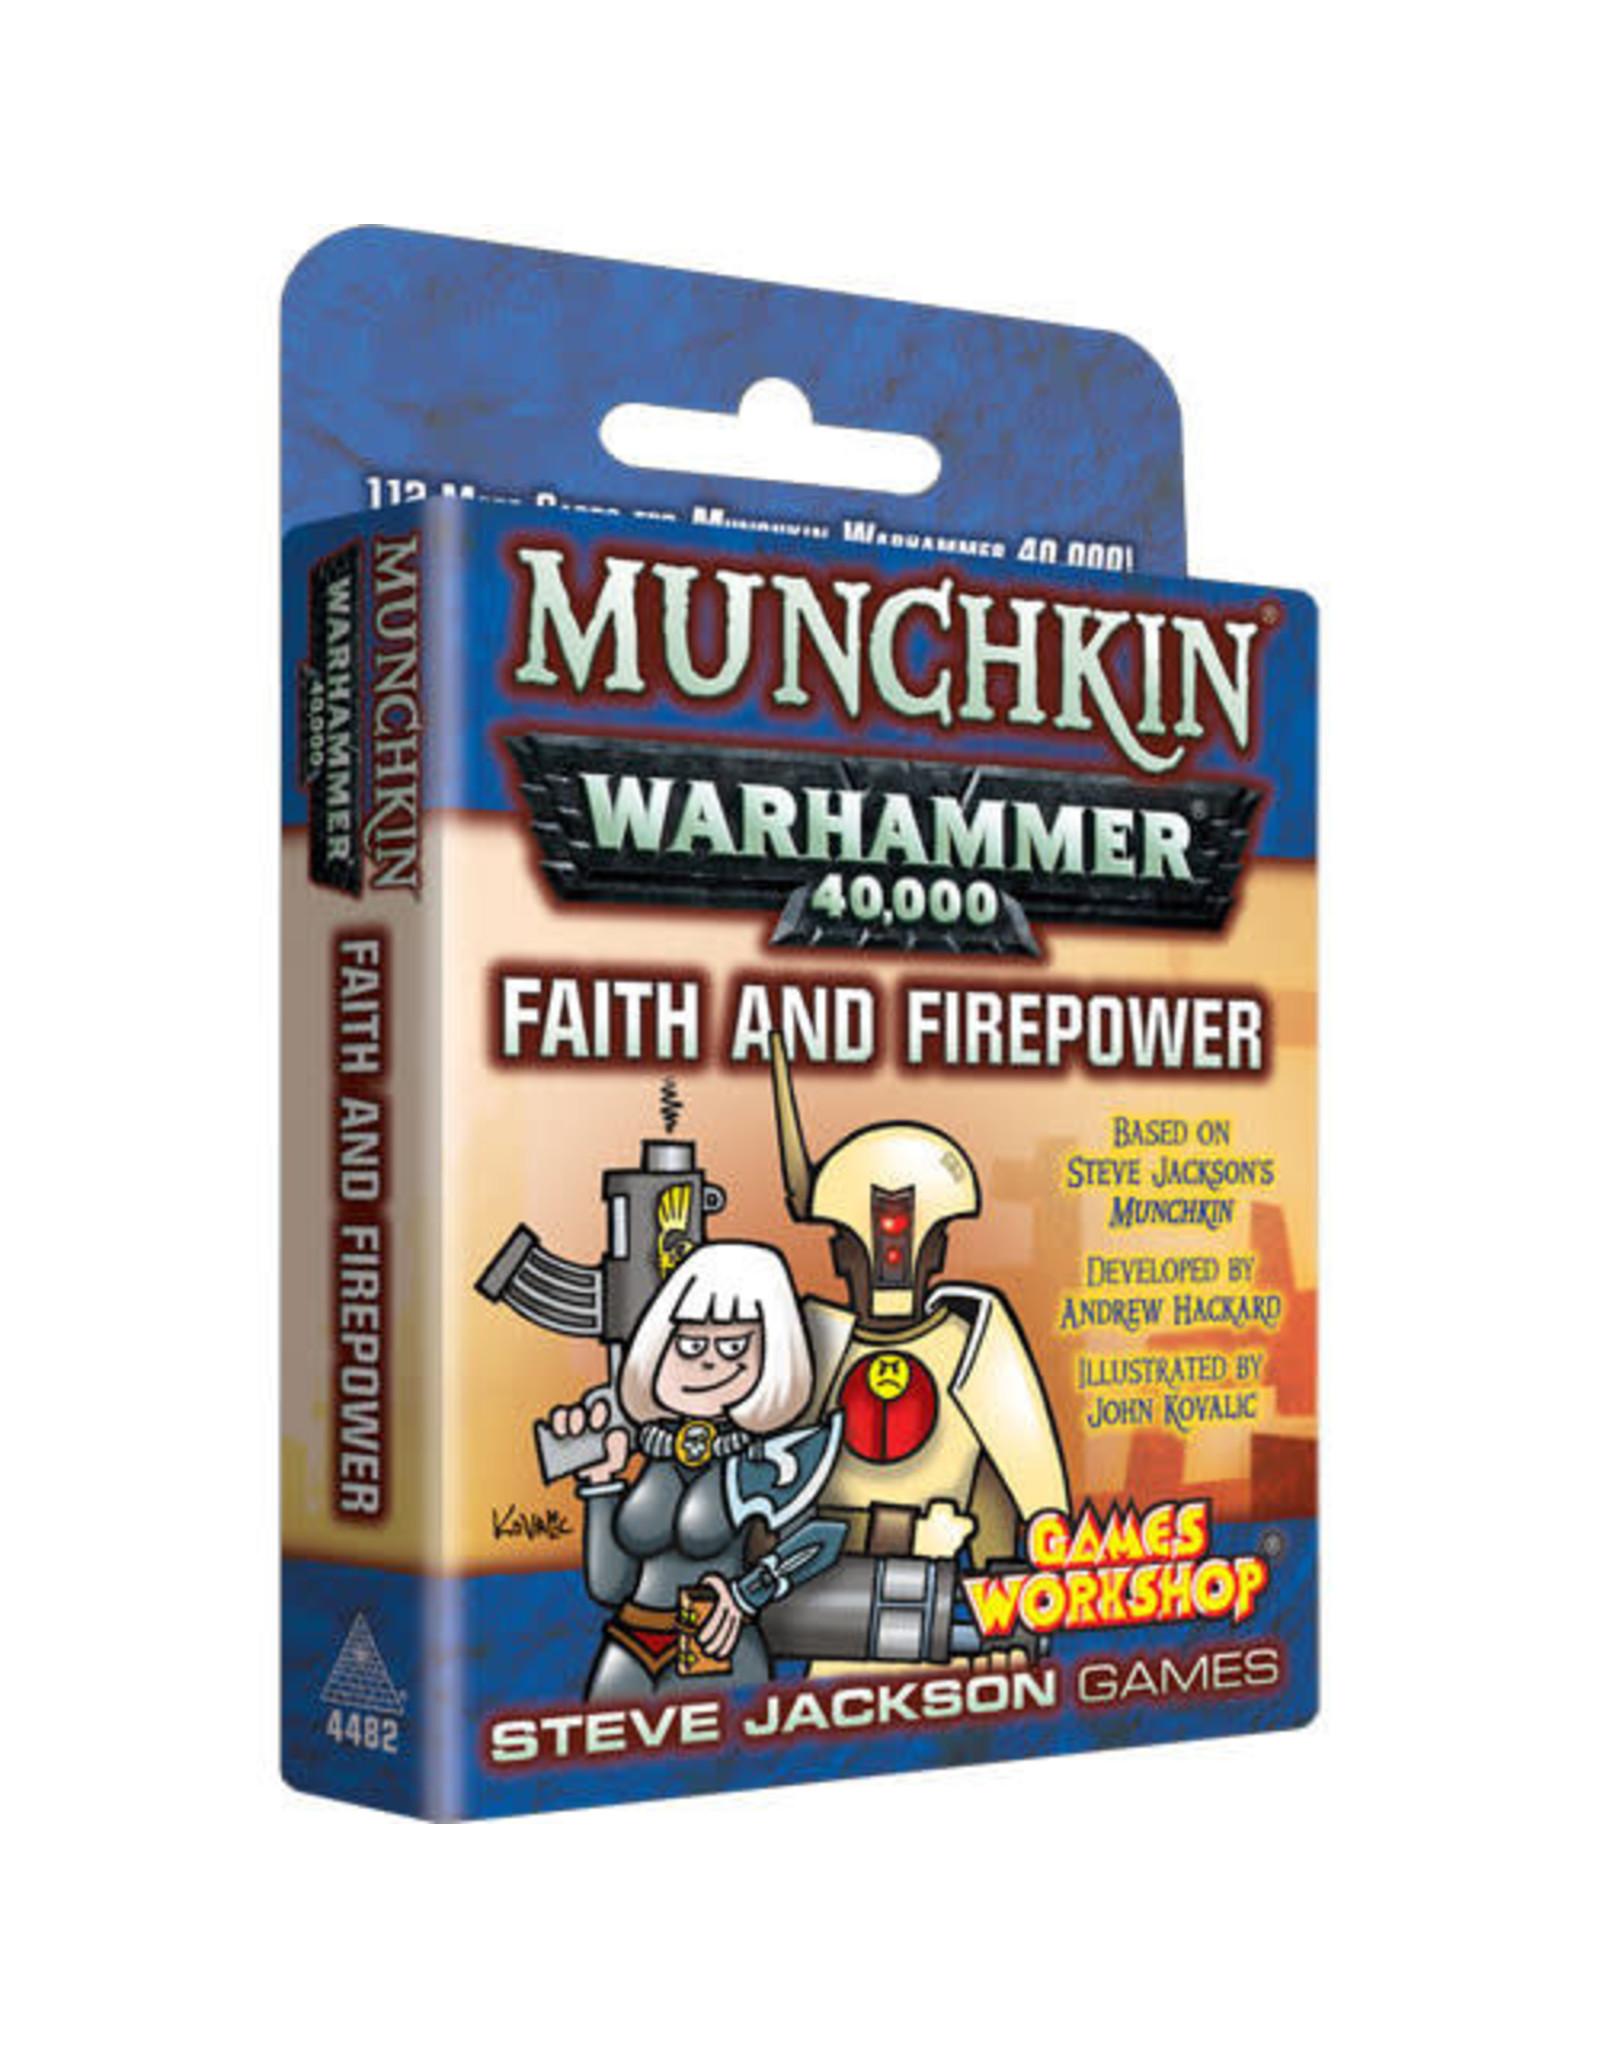 Steve Jackson Games Munchkin: Munchkin Warhammer 40K - Faith and Firepower Expansion